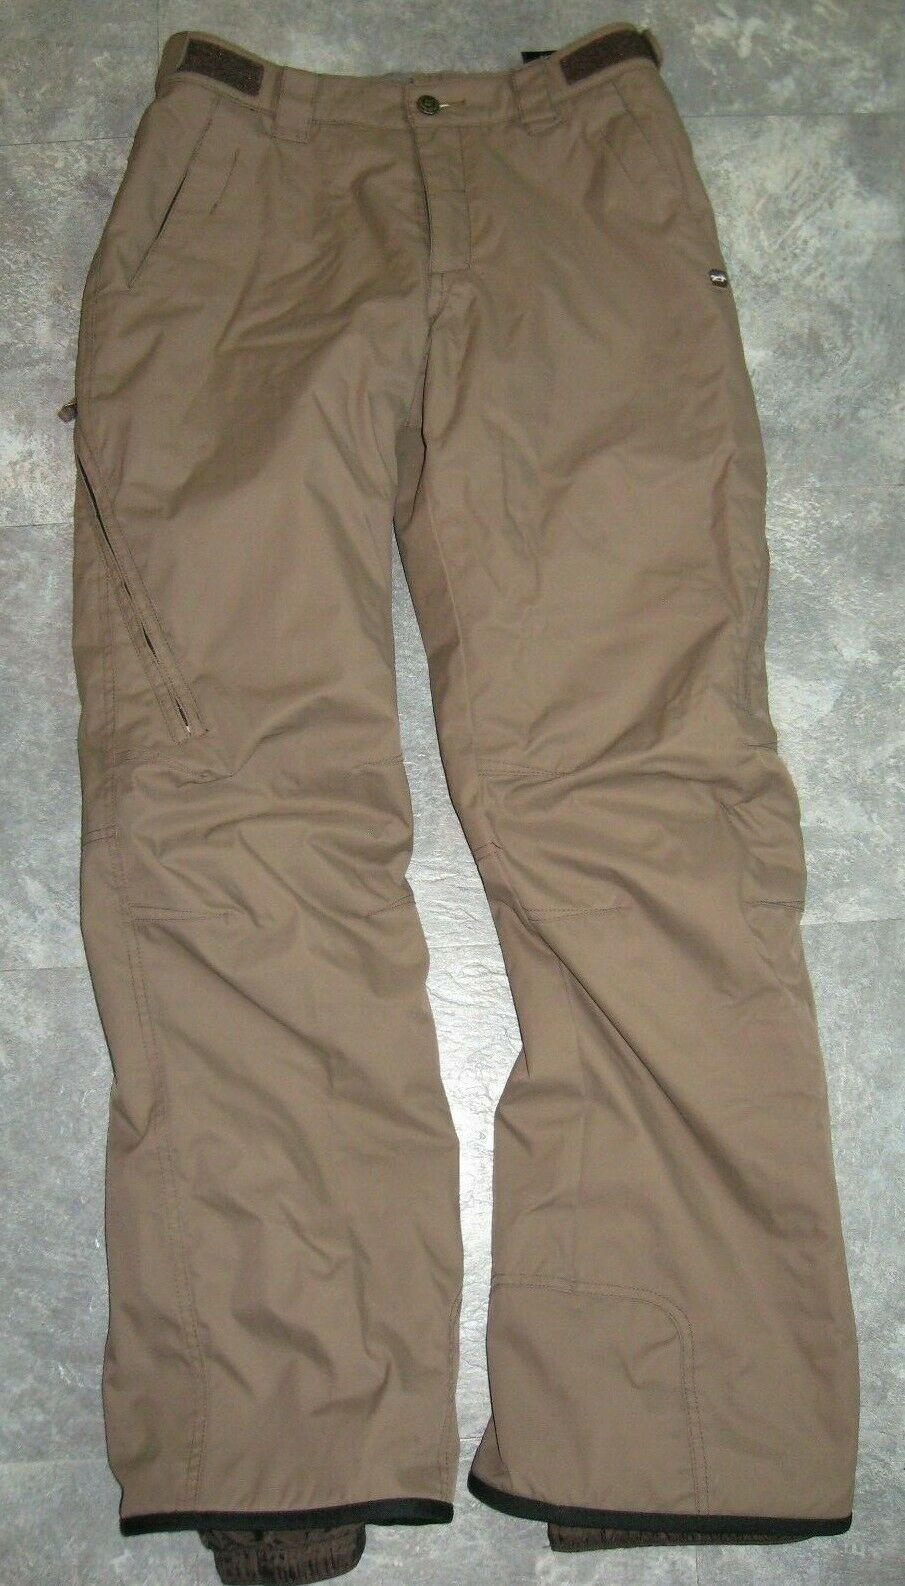 ORAGE Ski Snowboard Snow Pants Women's Brown Insulated - Size XS